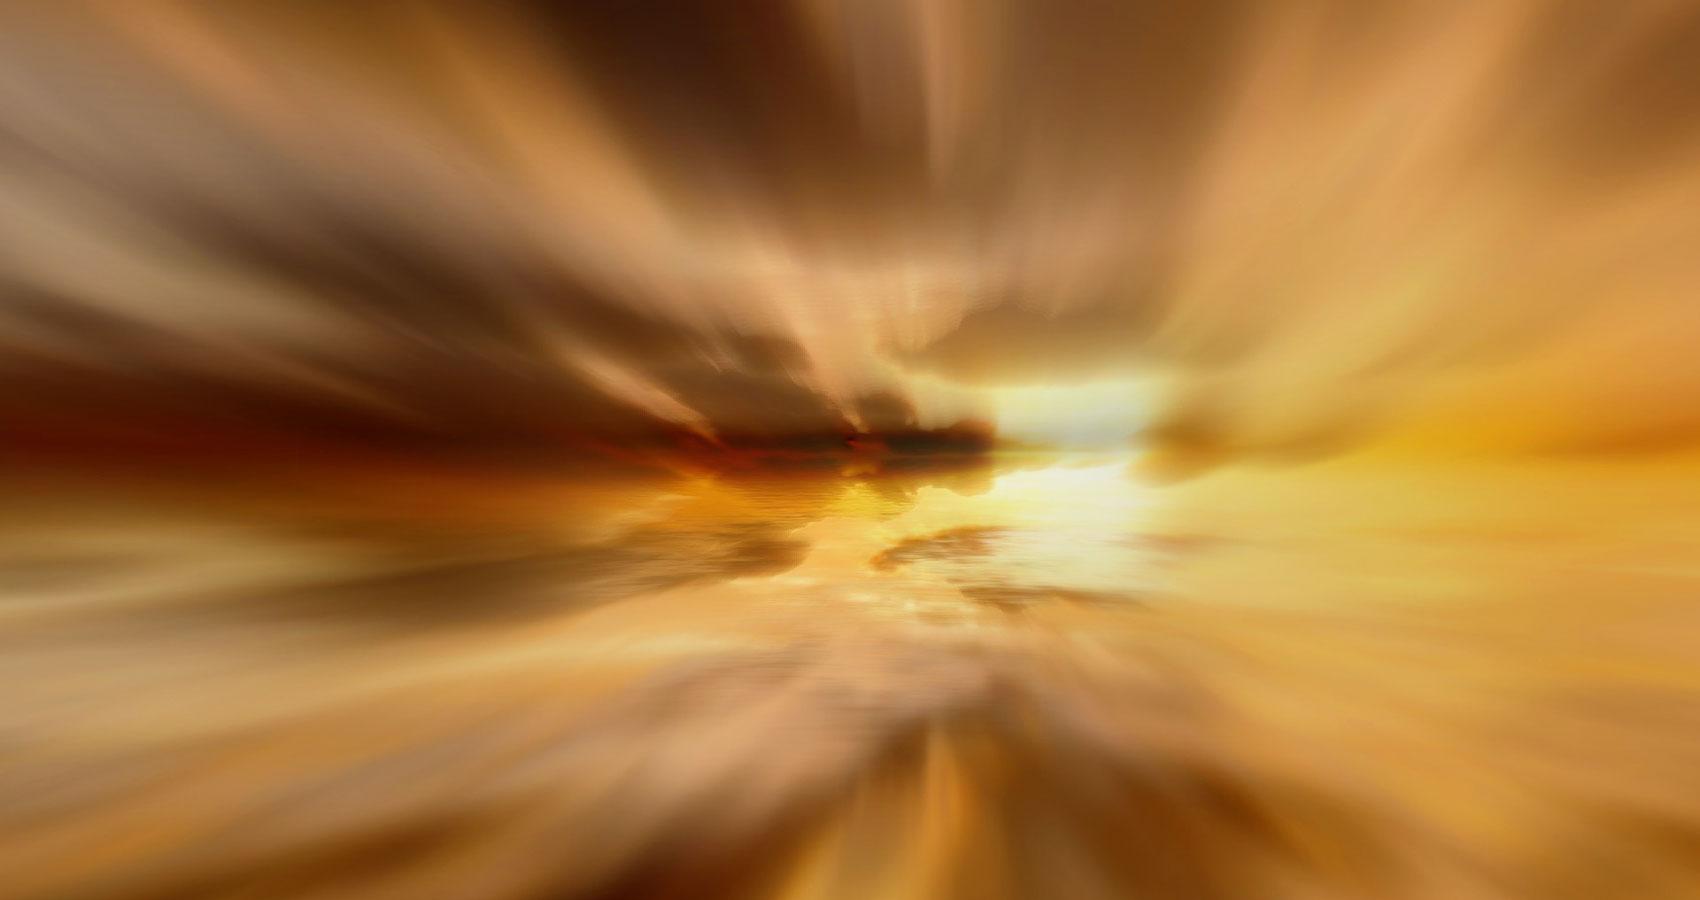 Gold Heaven, a poem written by Hongri Yuan at SpillWords.com